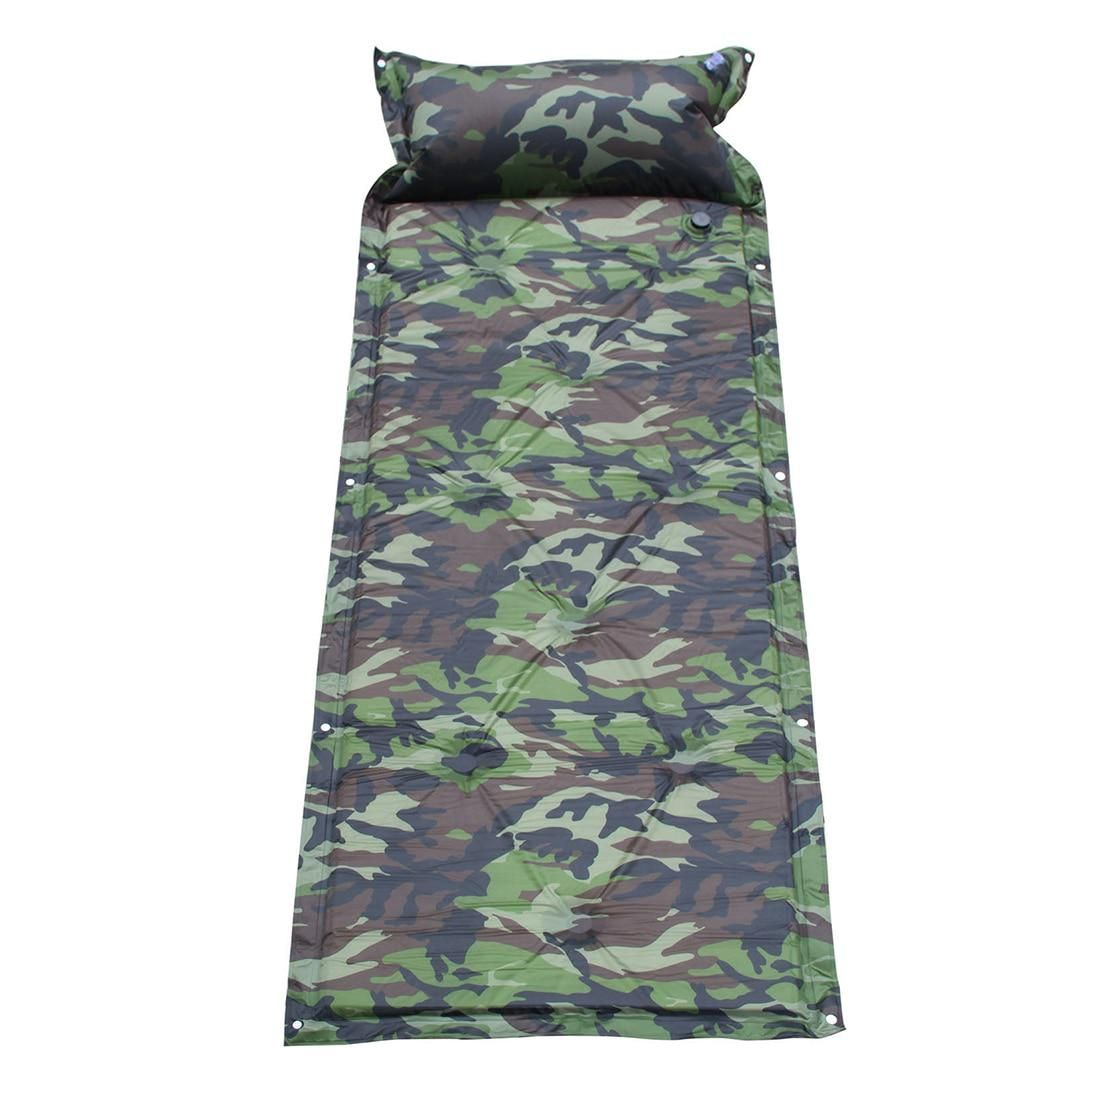 INFLATING CAMPING ROLL MAT PAD INFLATABLE PILLOW BED SLEEPING MATTRESS BAG